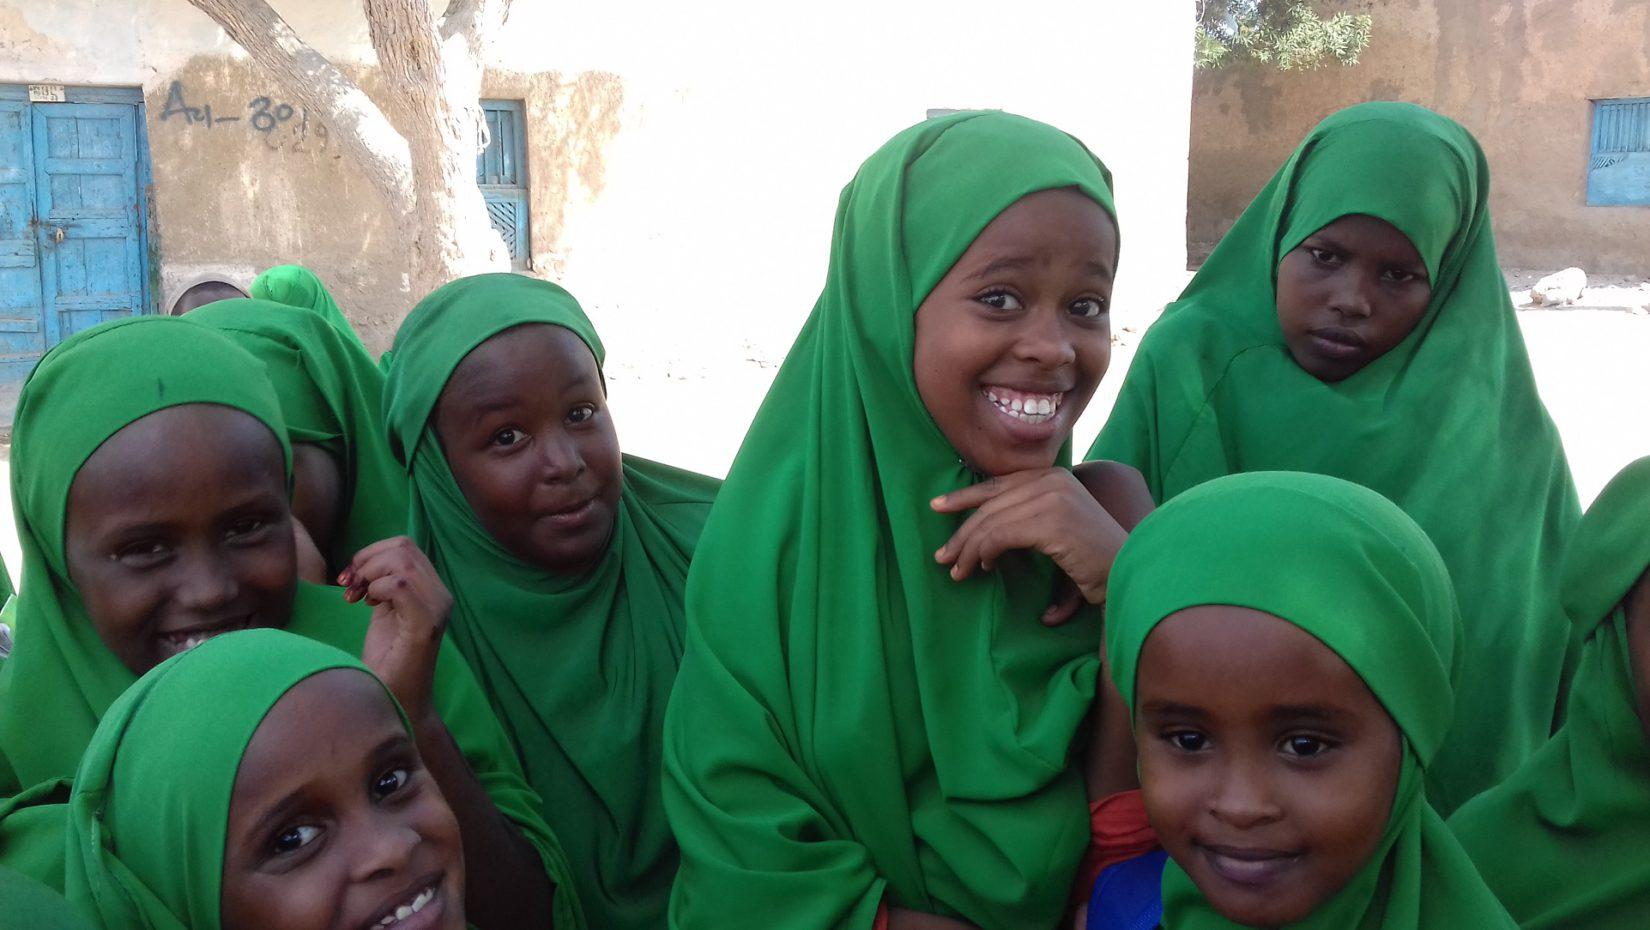 Ziua a 19-a: Poporul Somali din Somalia | #Pray30Days